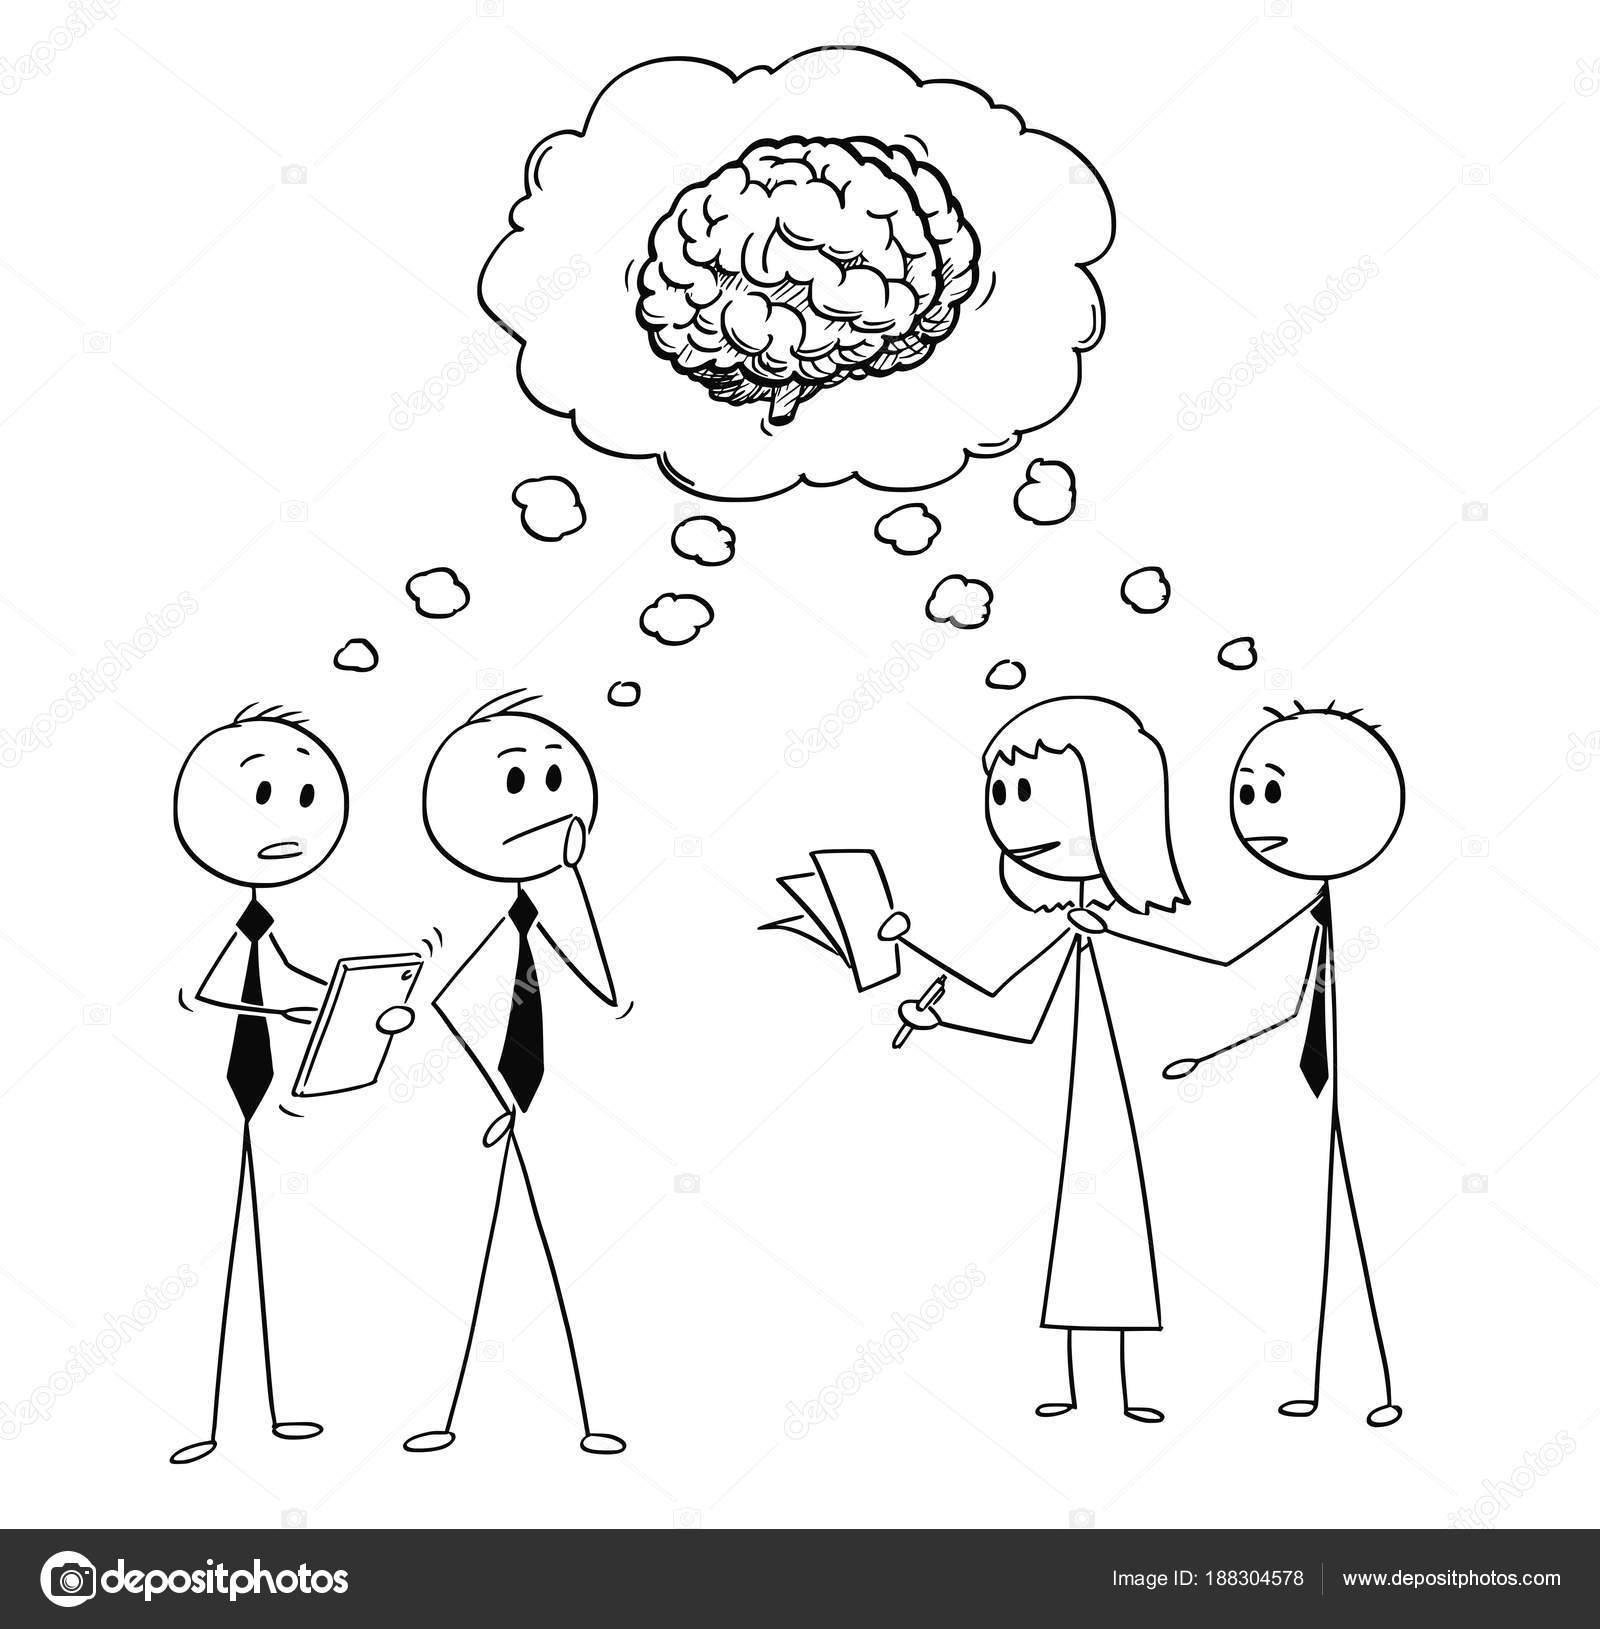 Dibujos Persona Pensando Dibujos Animados De Personas Pensando En